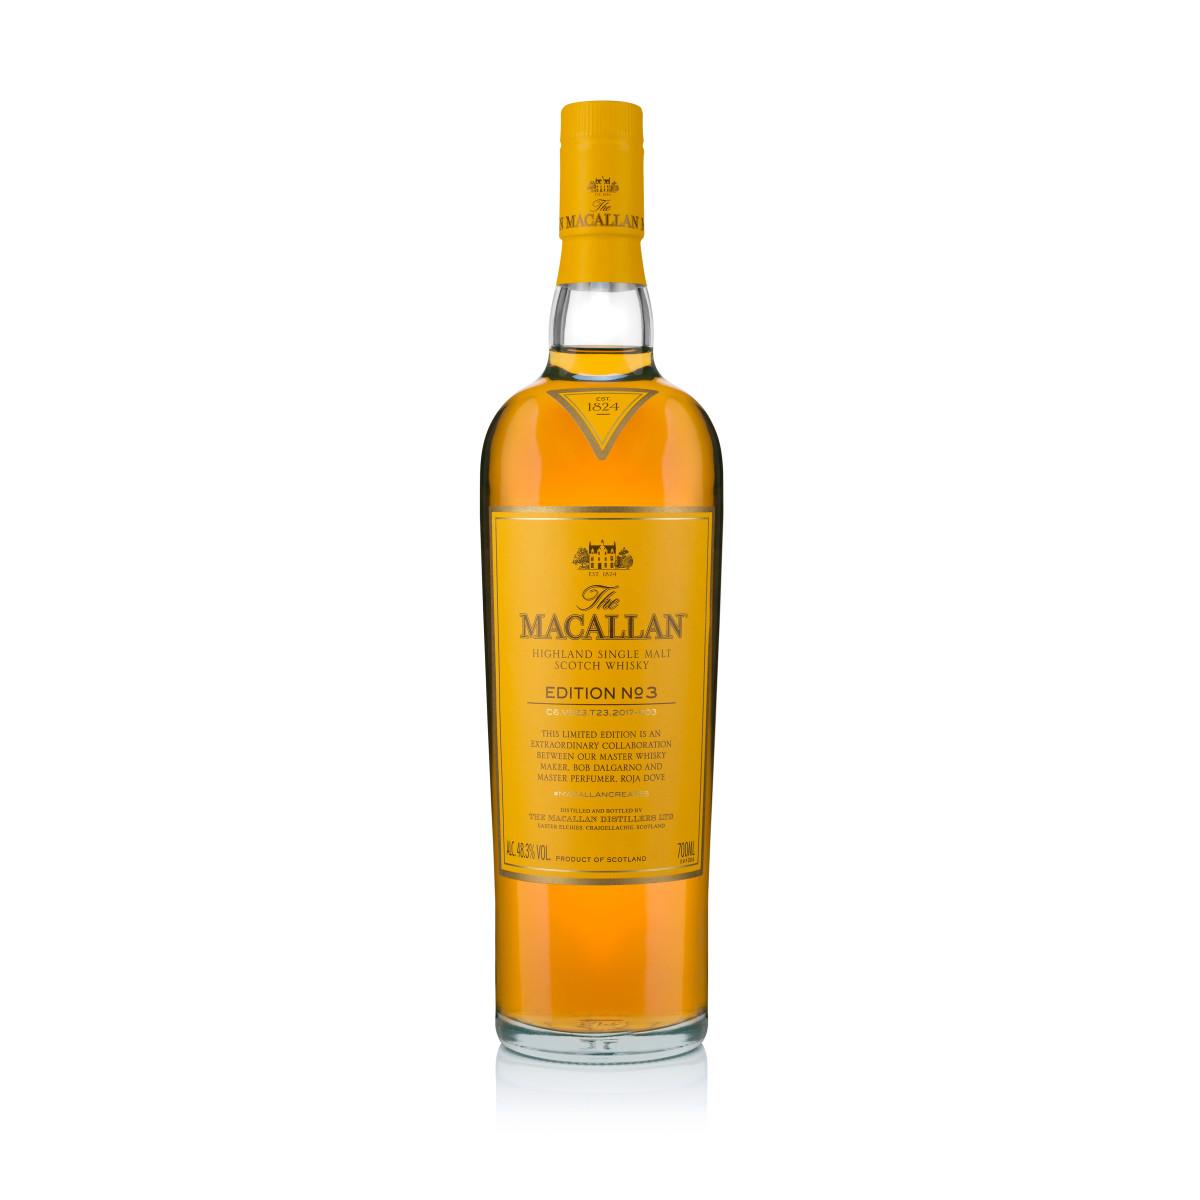 Macallan Edition No 3